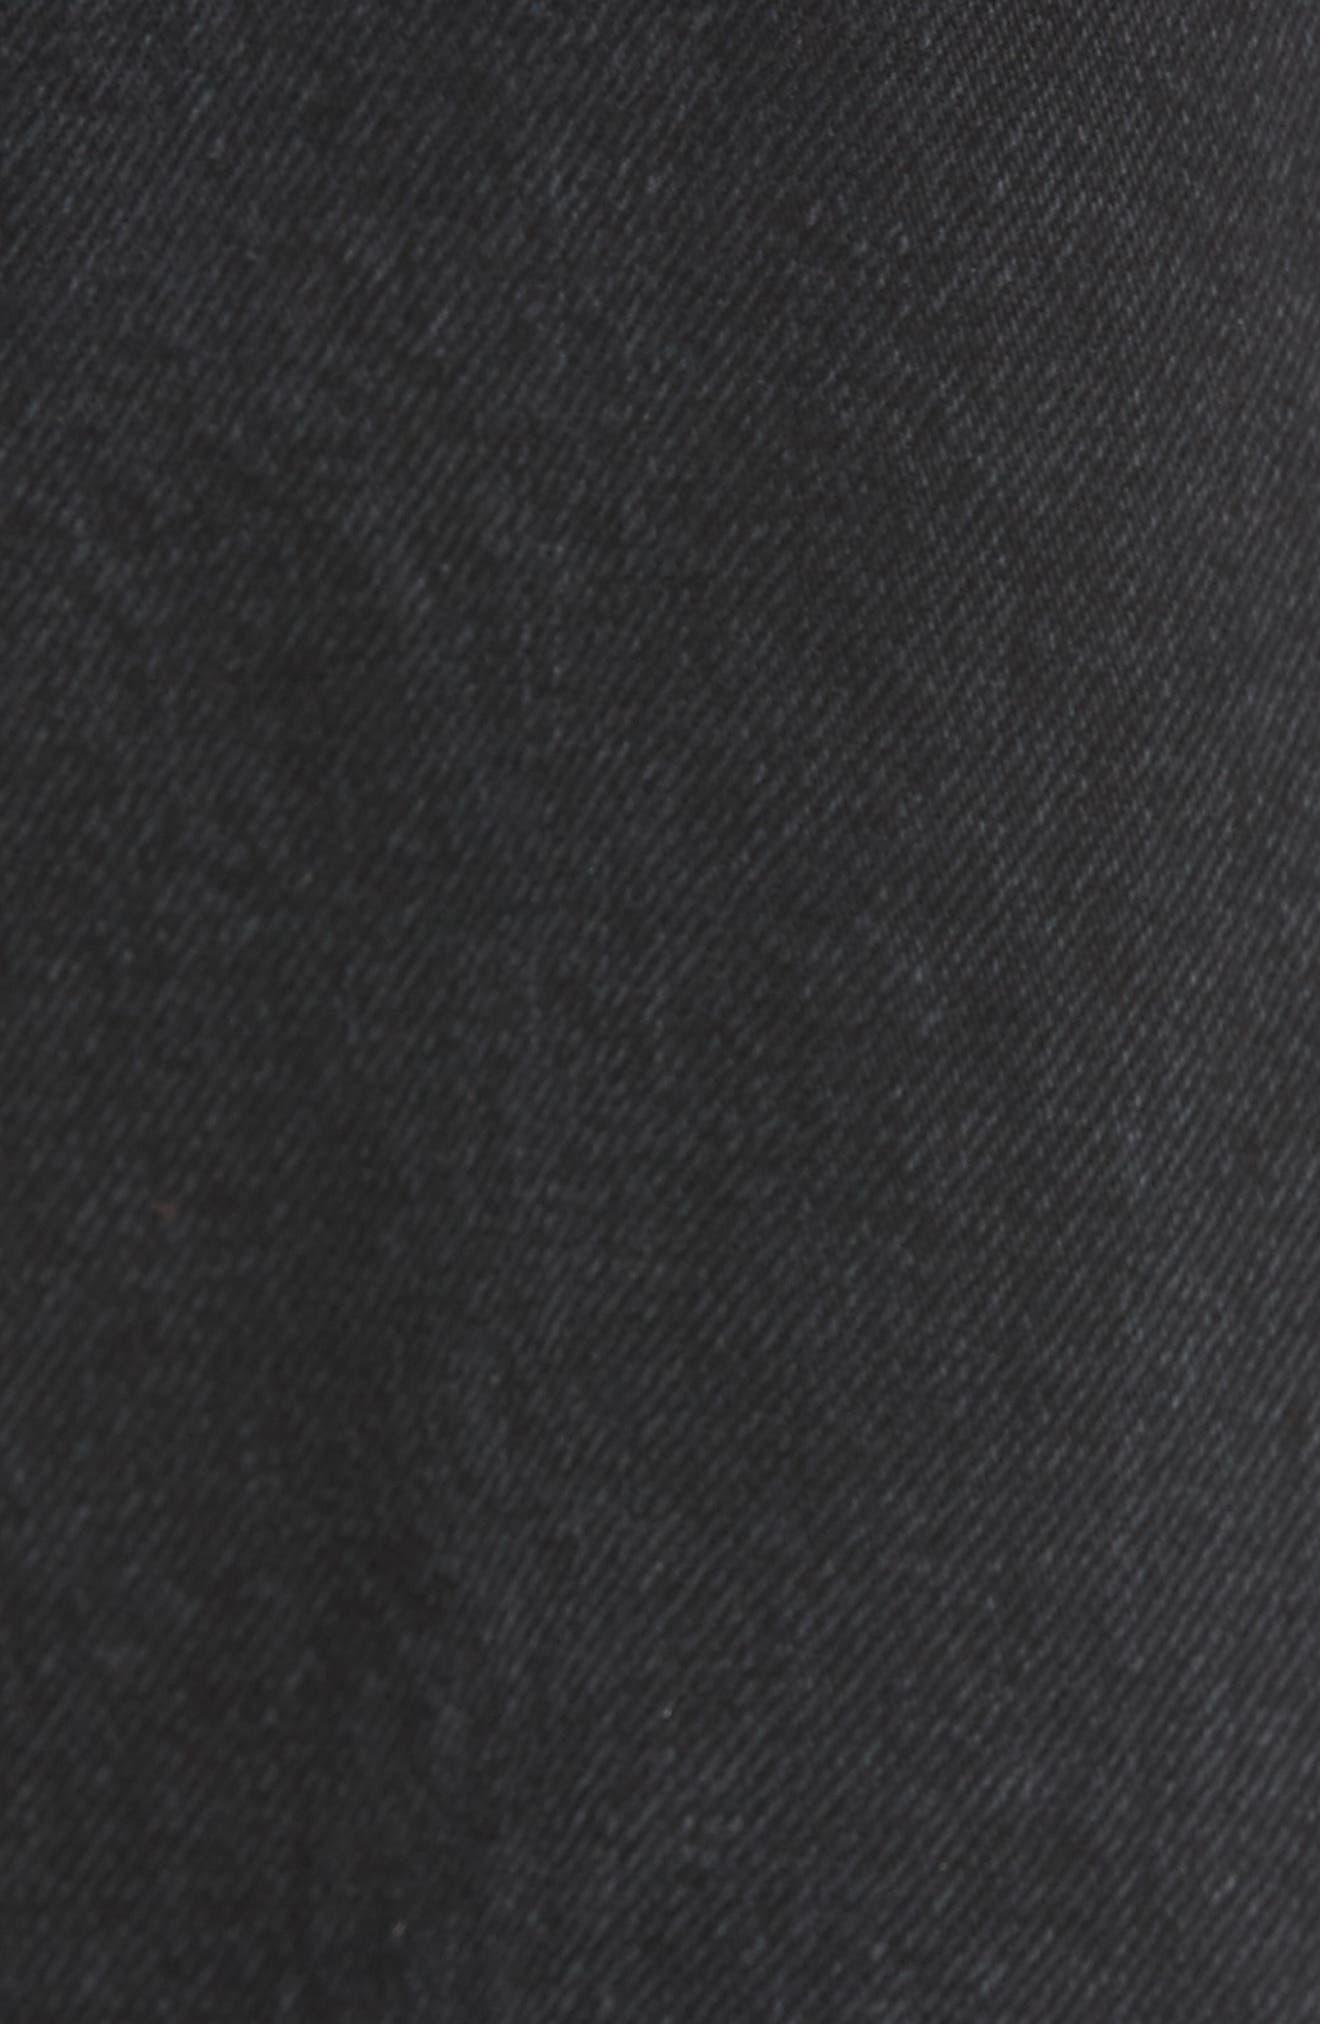 Hepburn High Waist Wide Leg Jeans,                             Alternate thumbnail 5, color,                             020